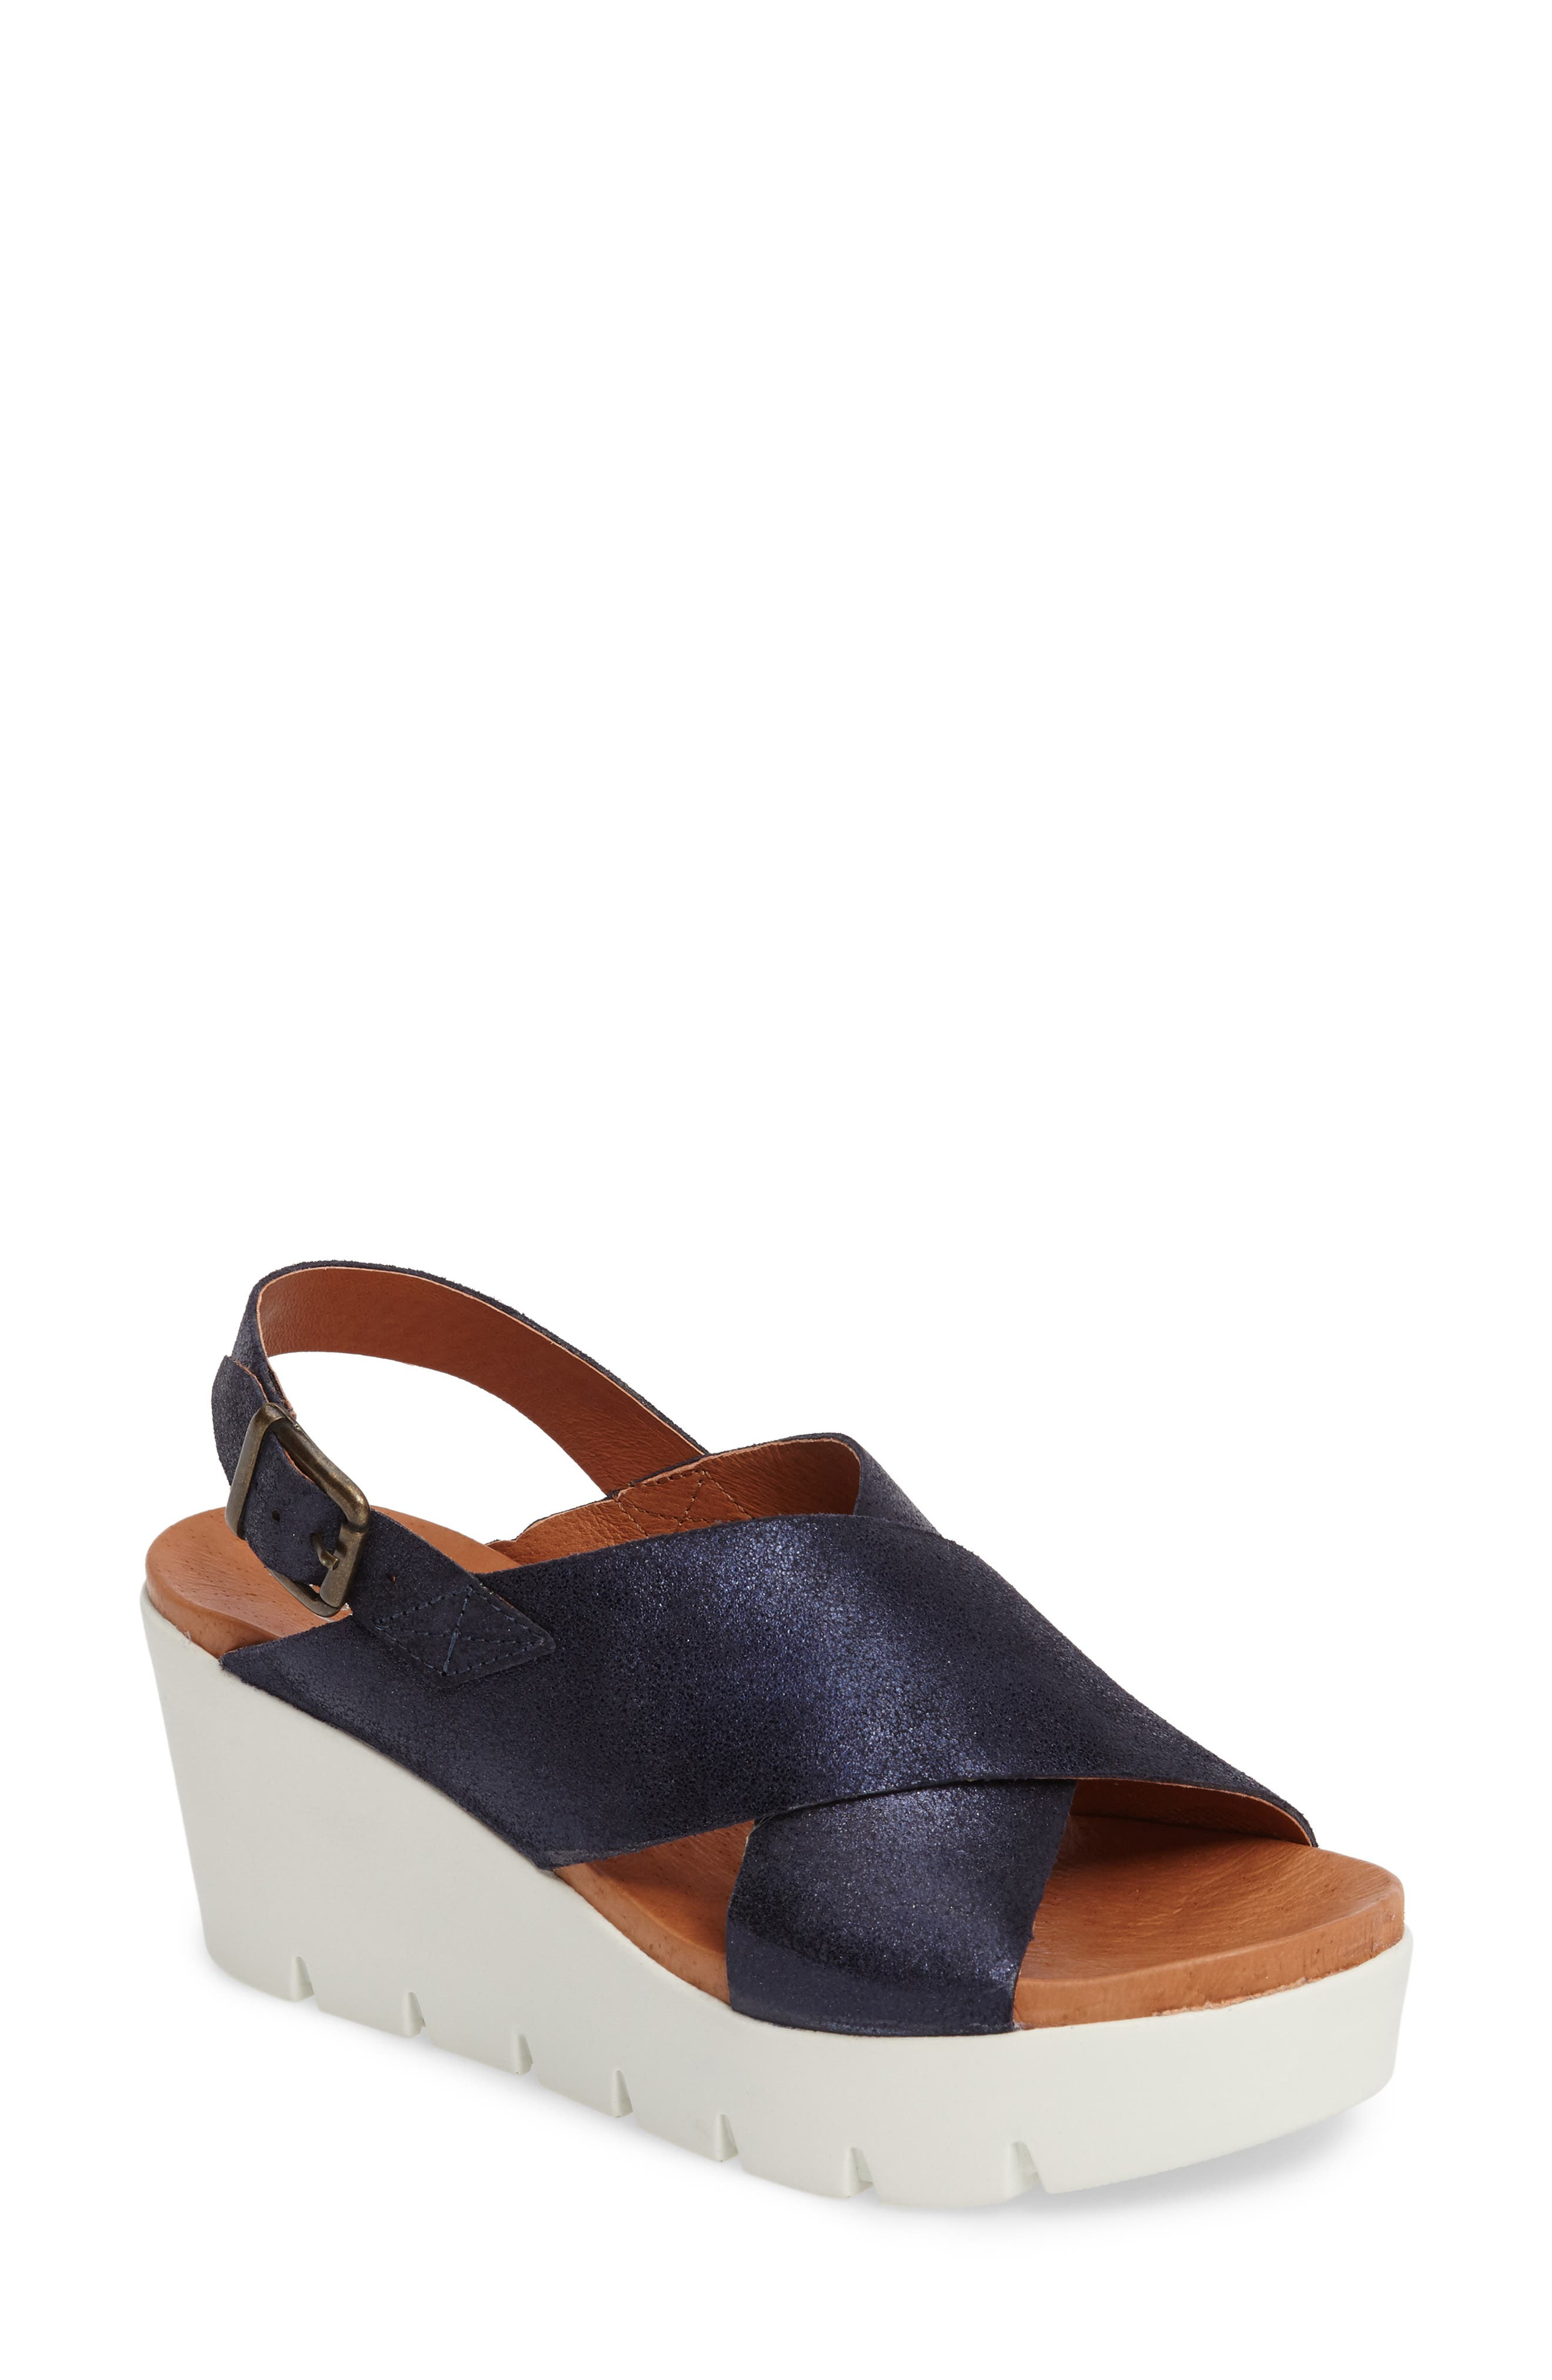 Payton Platform Wedge Sandal,                             Main thumbnail 1, color,                             Navy Glitter Suede